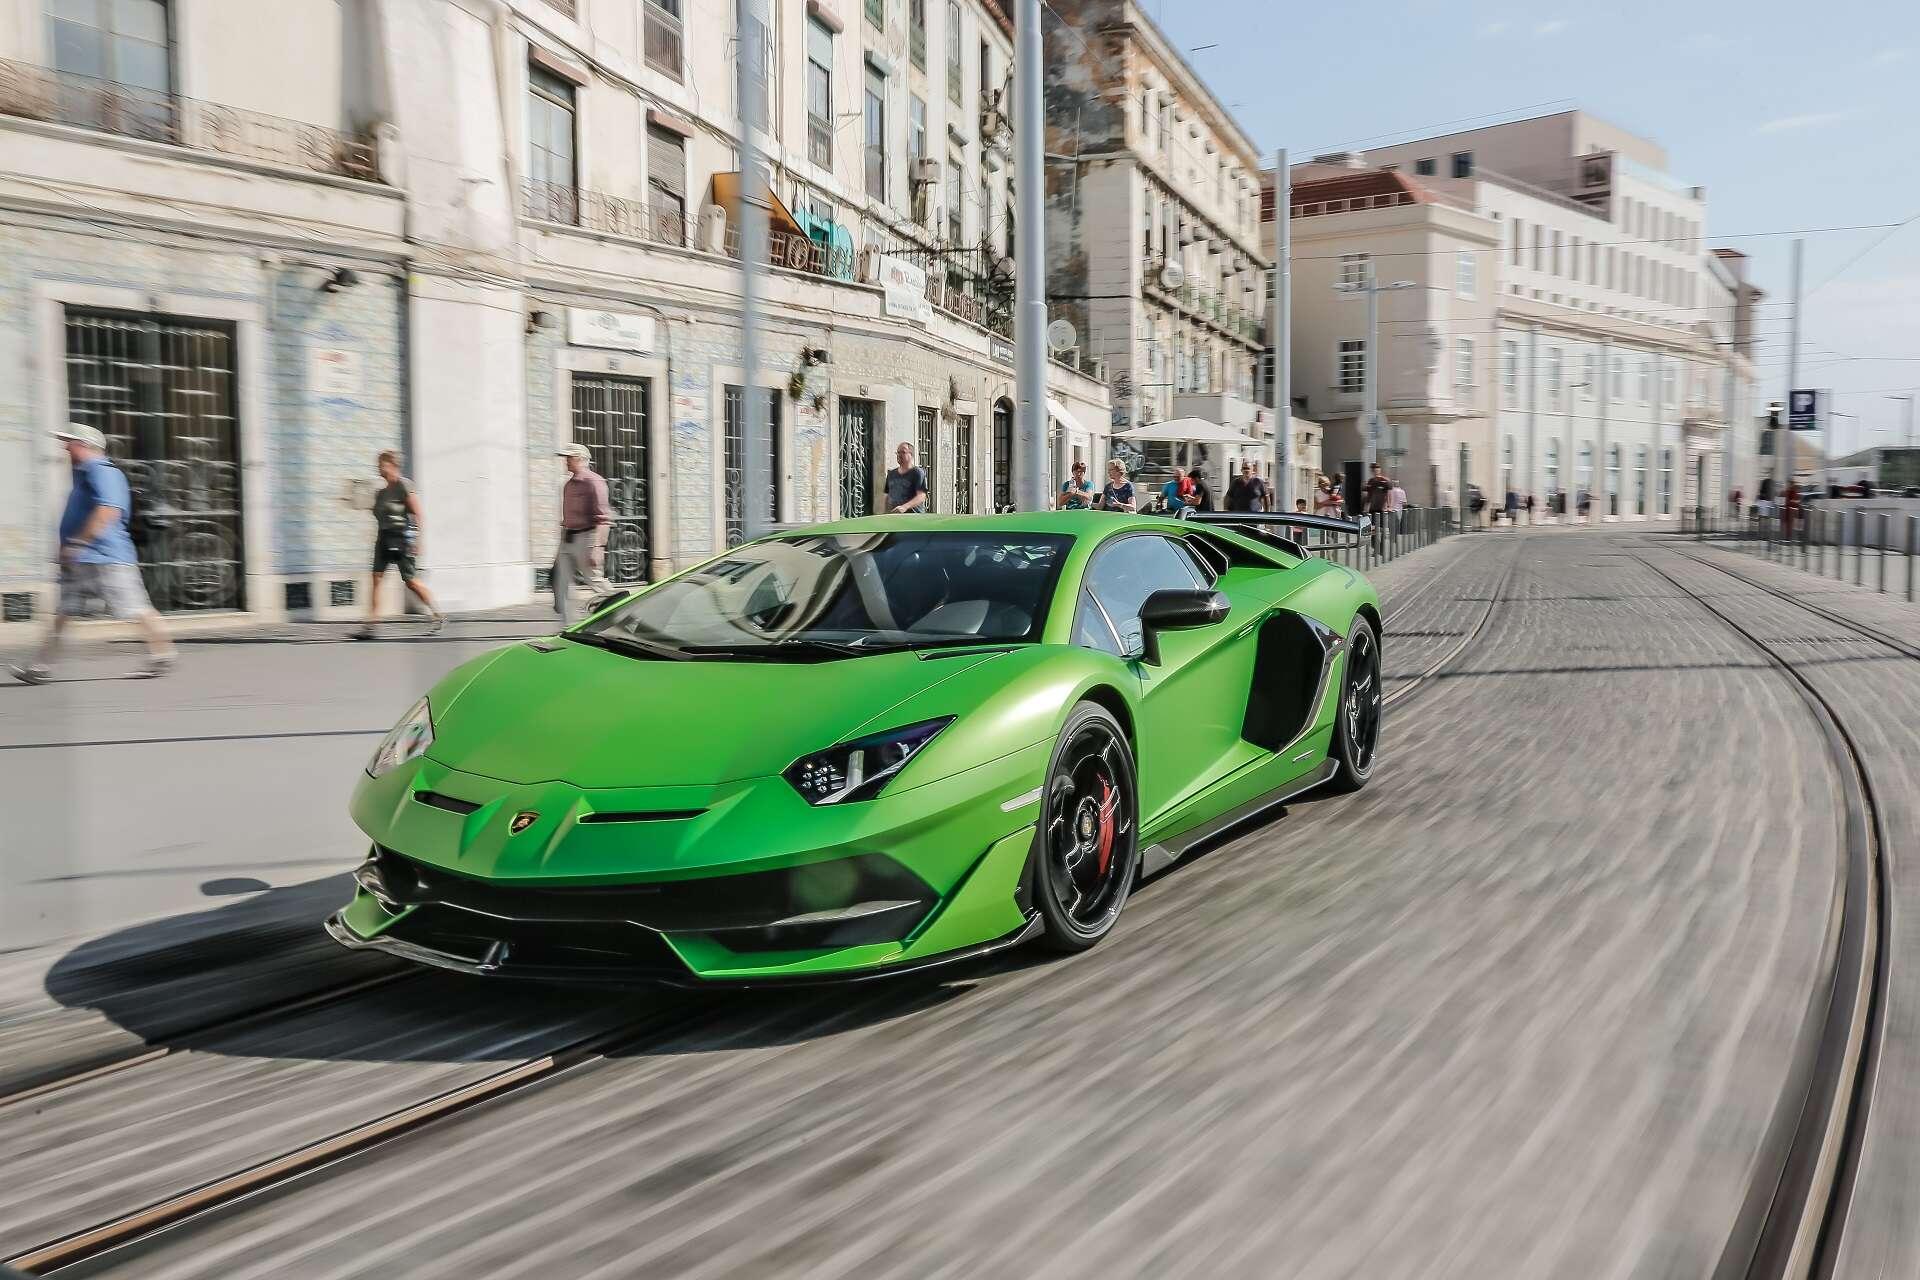 Next Gen Lamborghini Aventador Will Get First Ever Hybrid V 12 In